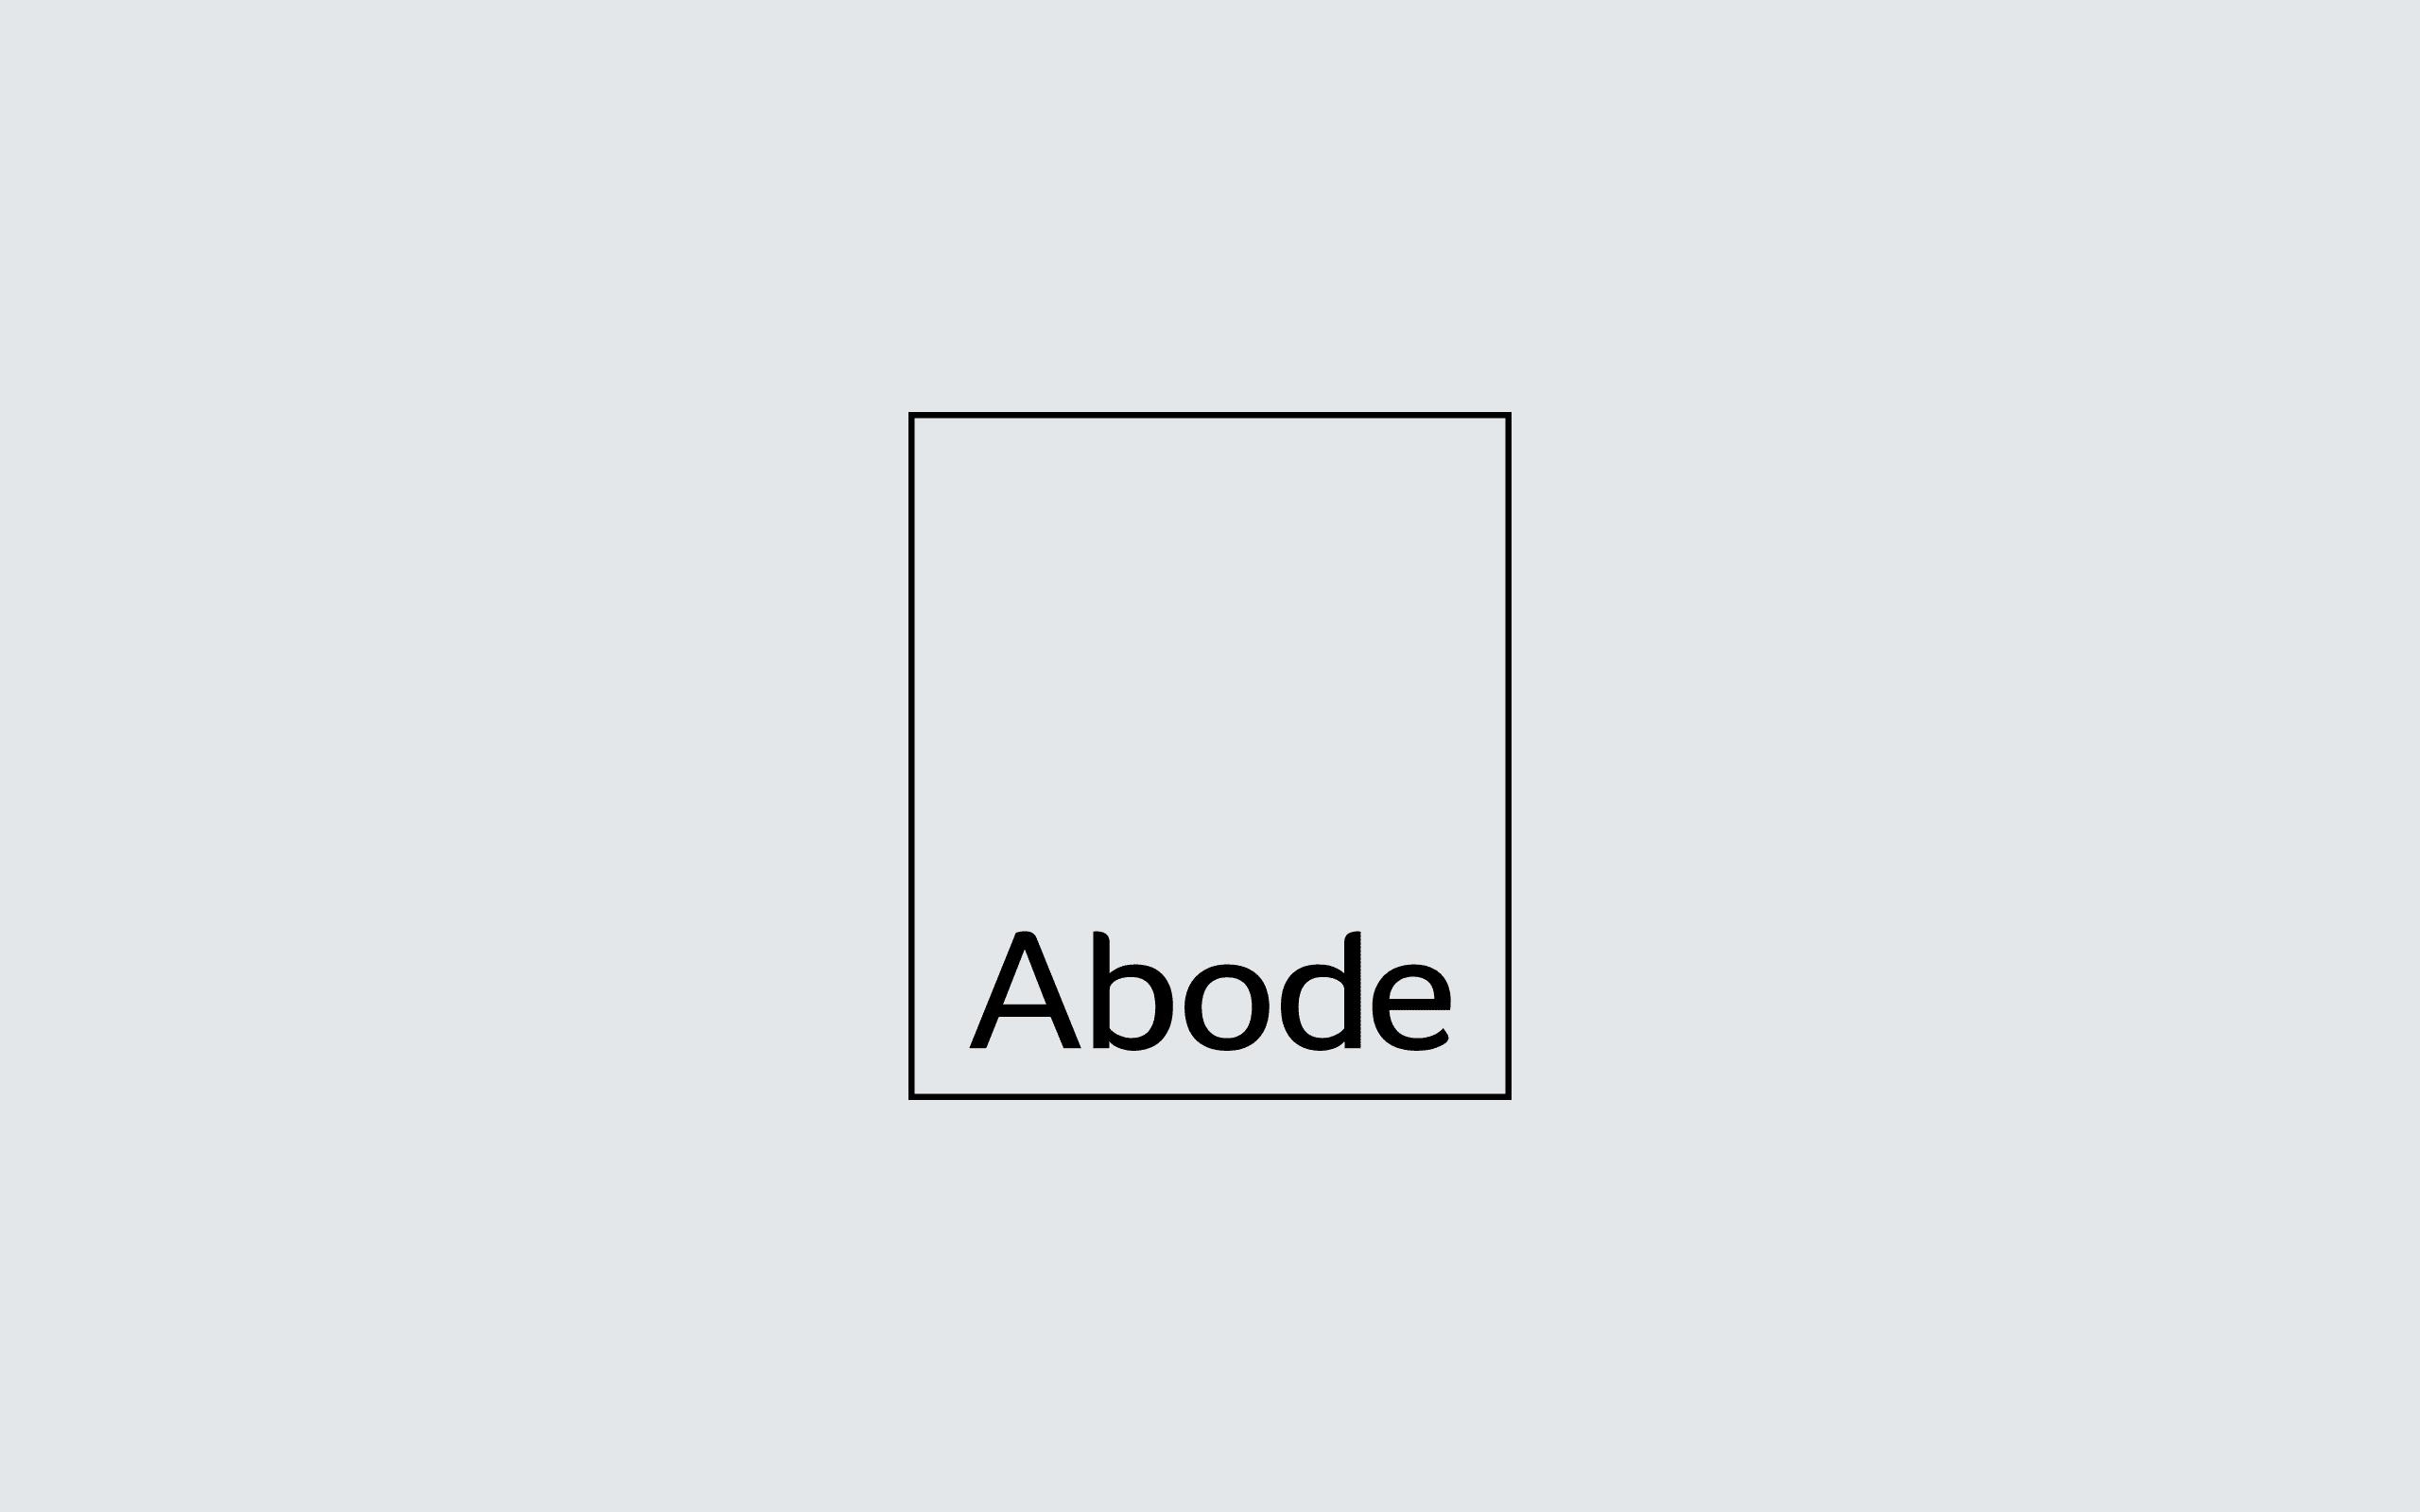 Abode Property Lettings identity | Zeke Creative